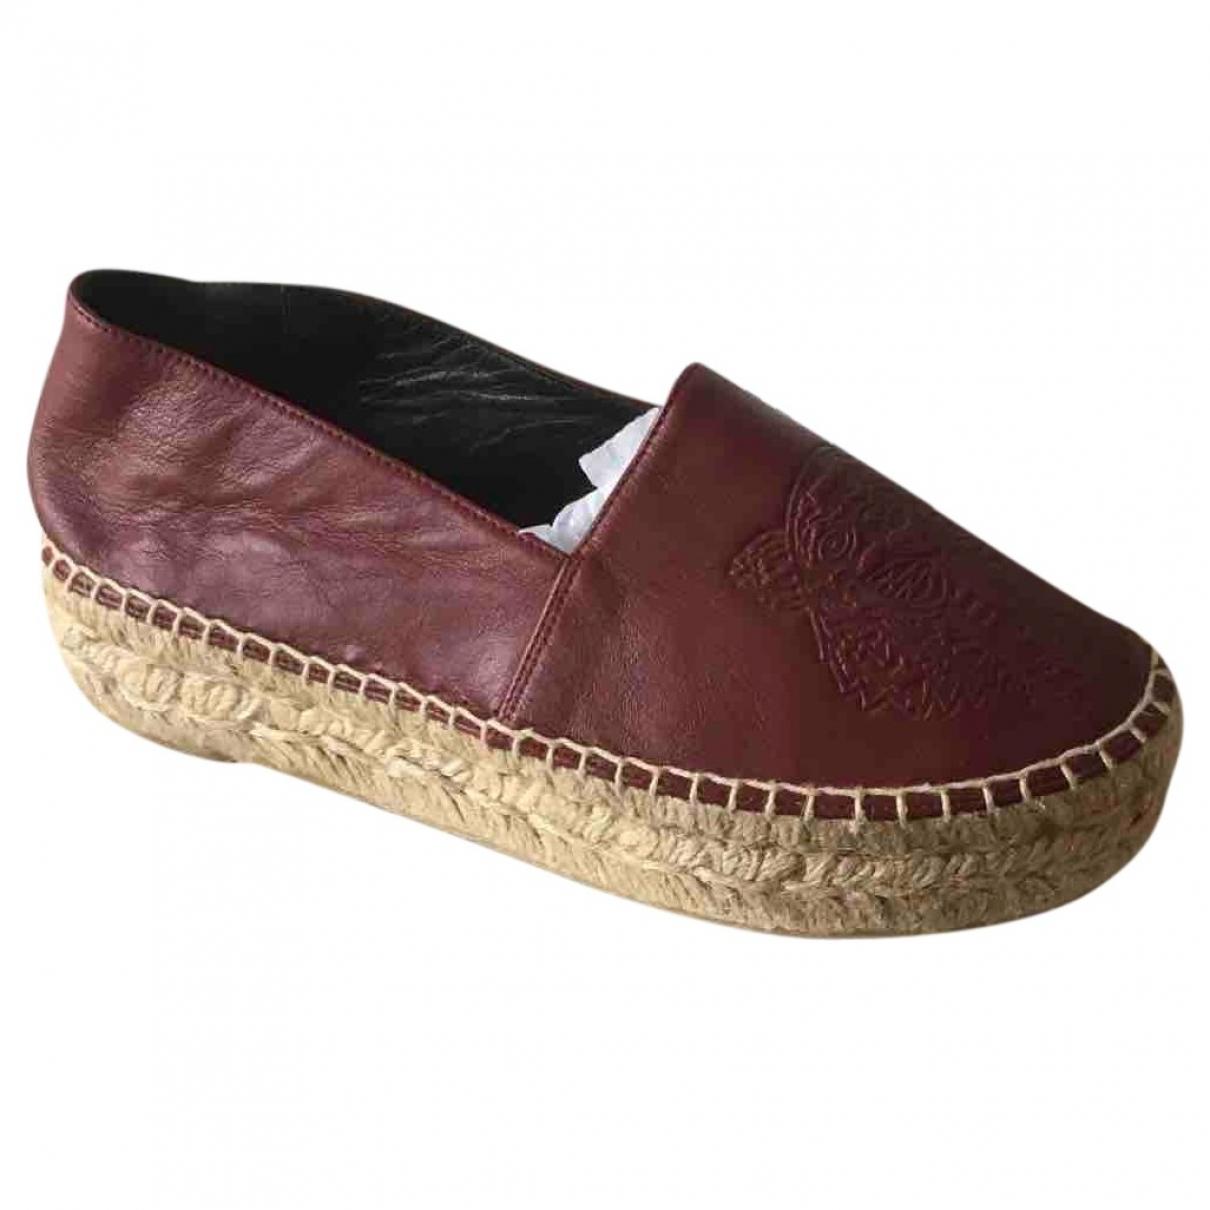 Kenzo \N Burgundy Leather Espadrilles for Women 35 EU